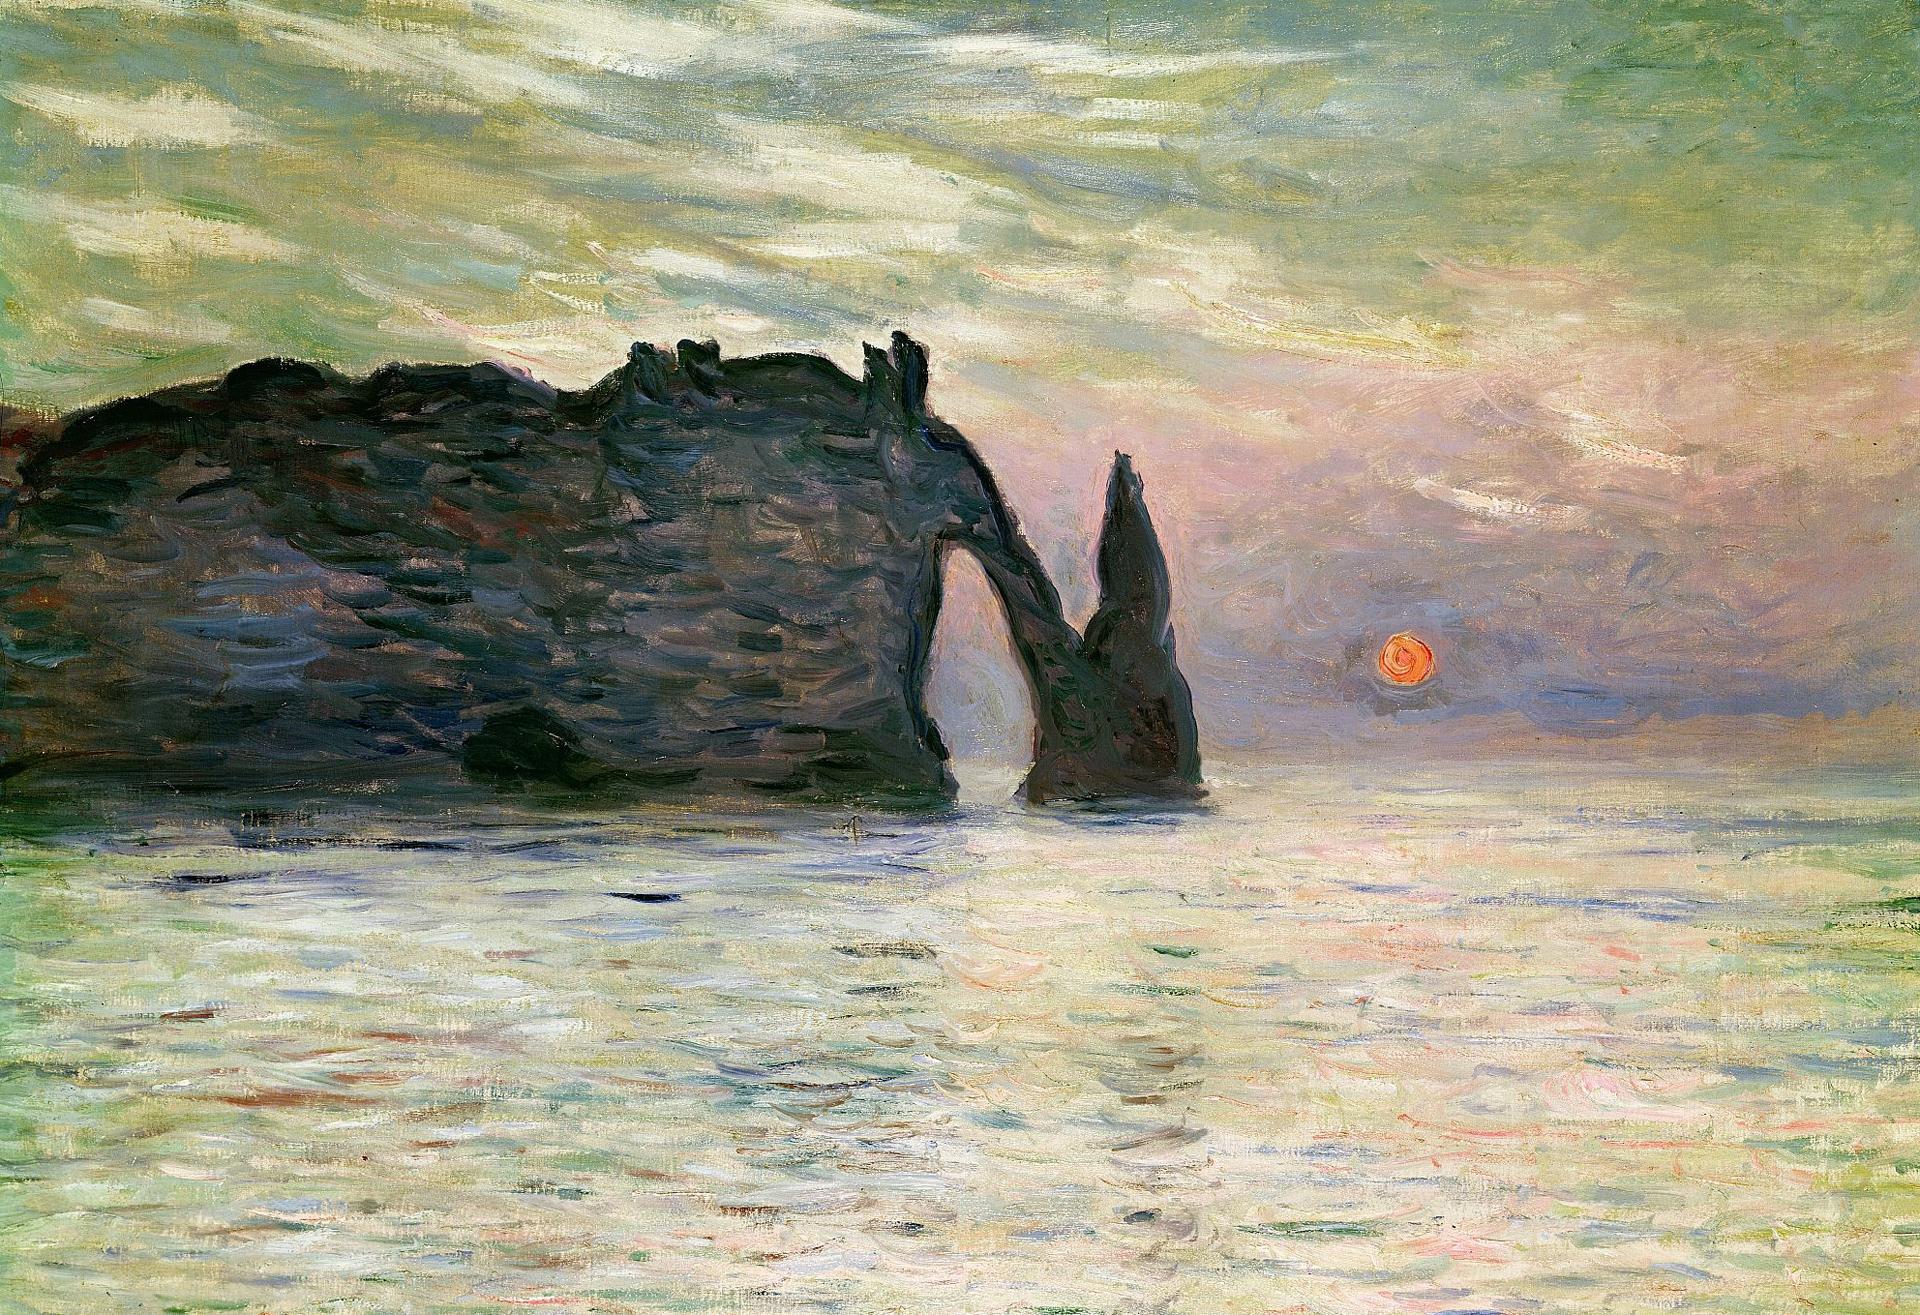 скалы и море < Этрета, закат >:: Клод Моне, описание картины - Моне Клод (Claude Monet) фото